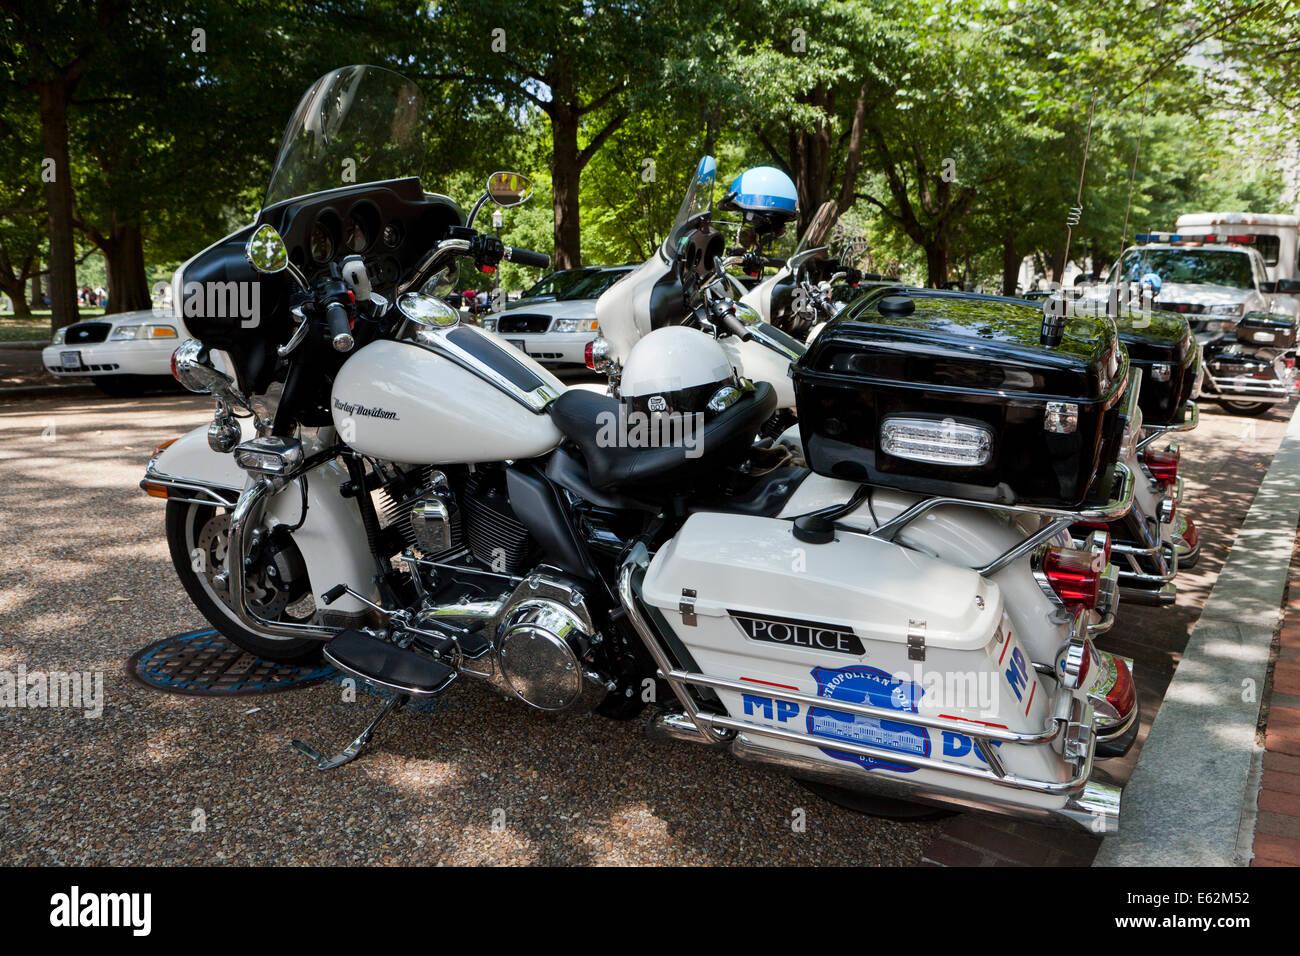 Washington, DC Metropolitan Police motorcycle - Stock Image